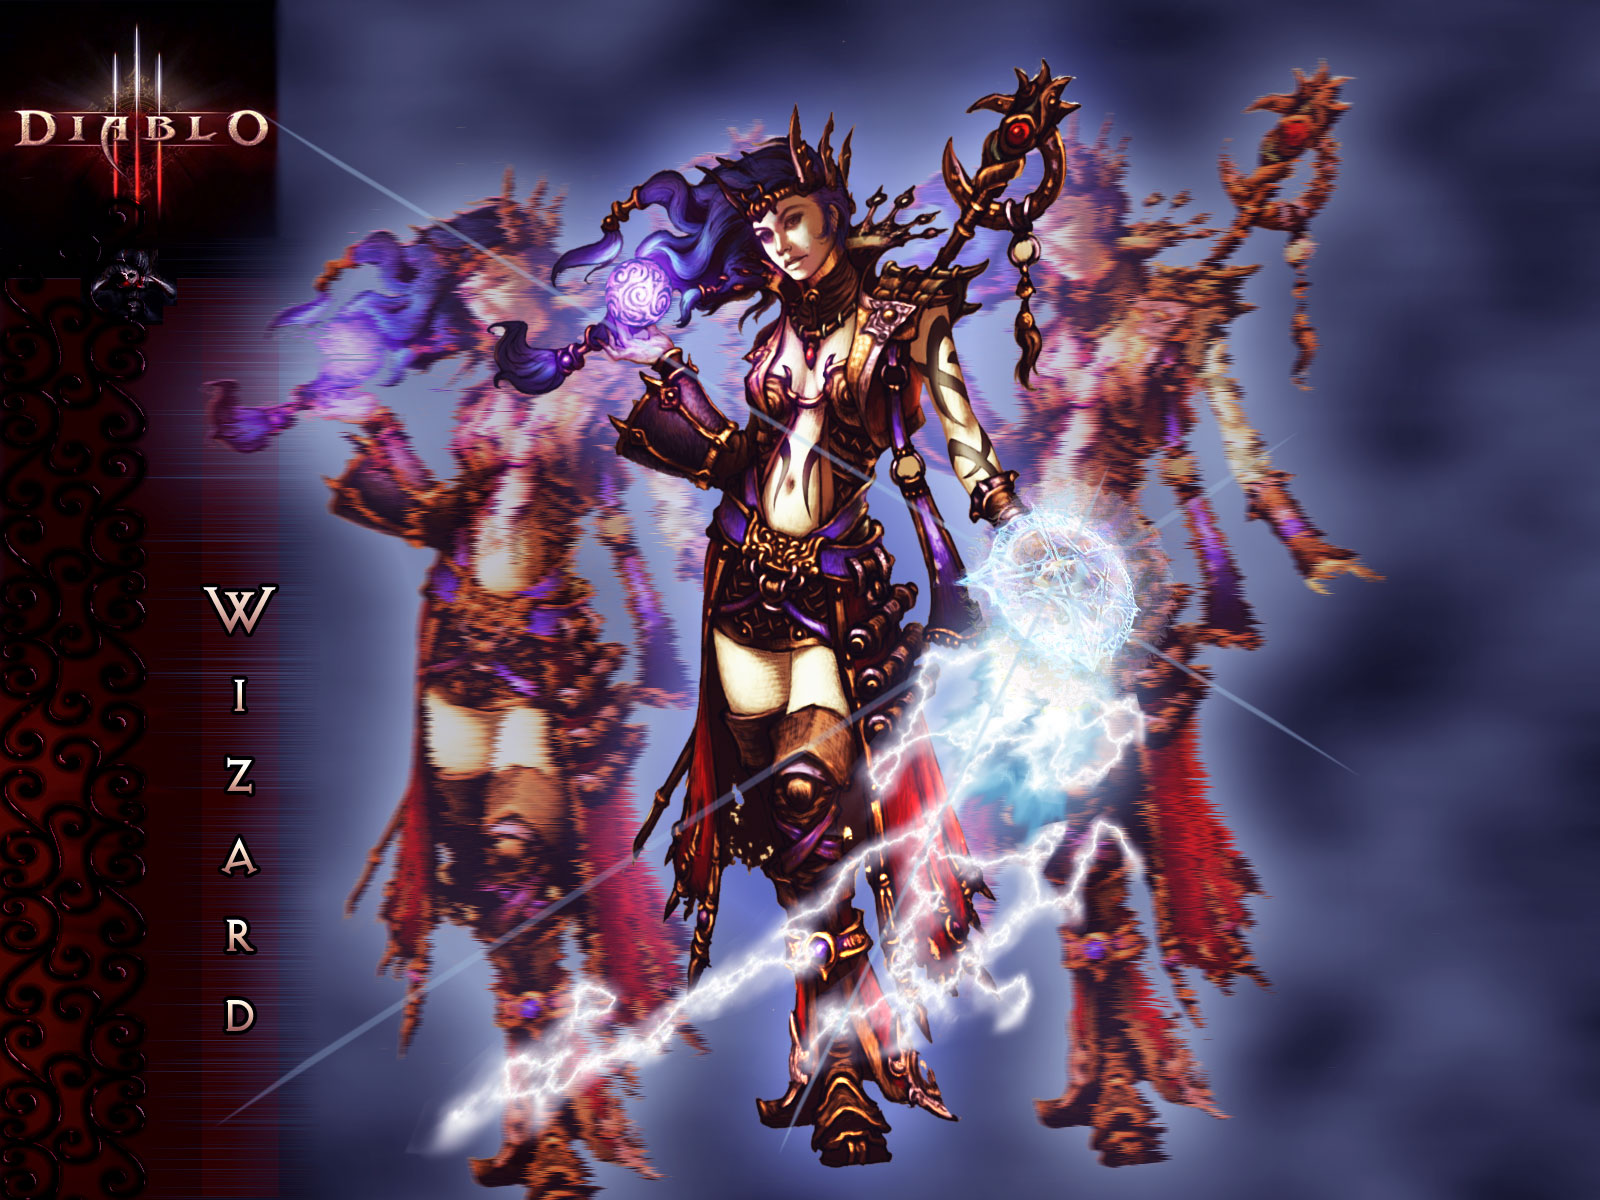 Diablo 3 xbox 360 nudepatch baixar erotic toons